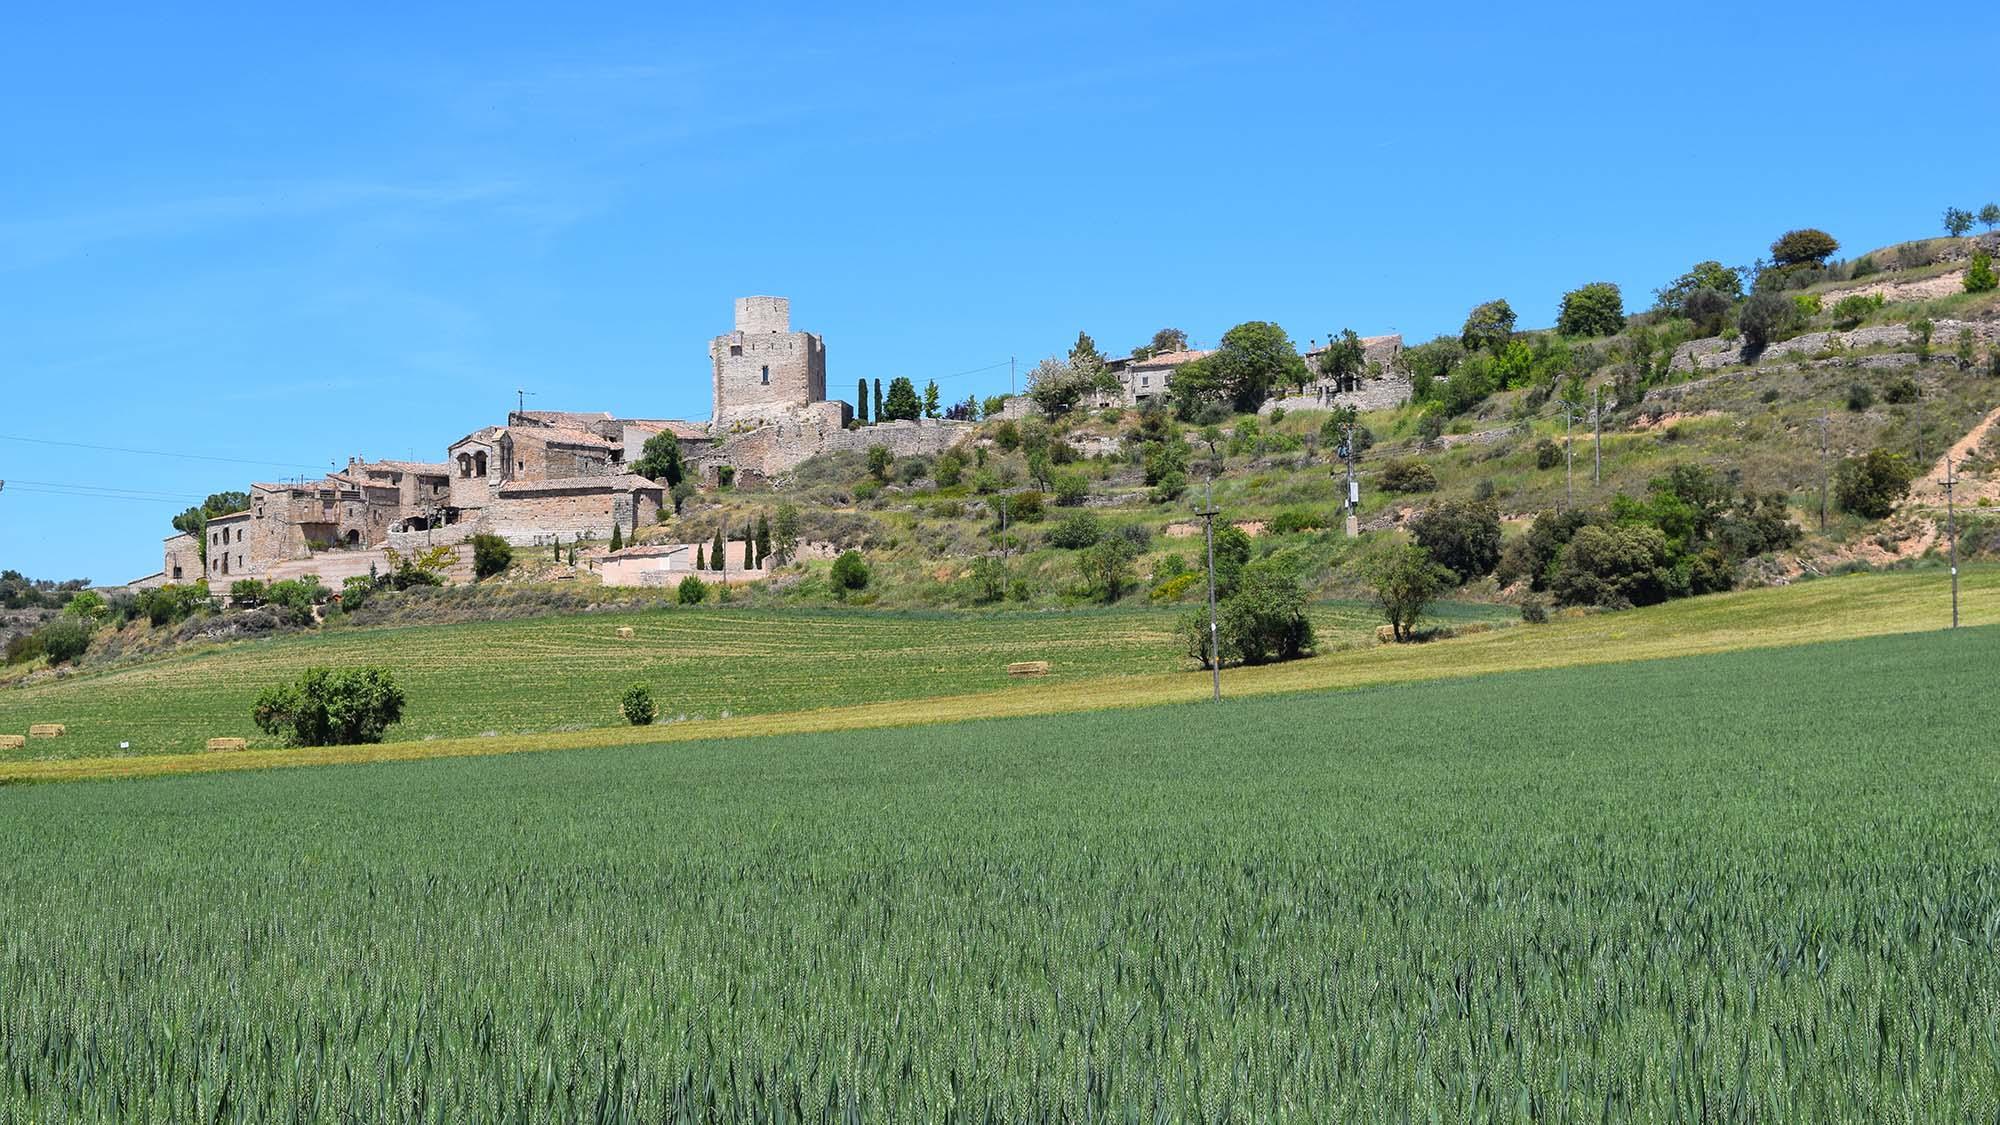 Hiking trail Les Oluges - Malgrat - La Prenyanosa - Castellnou d'Oluges - Les Oluge